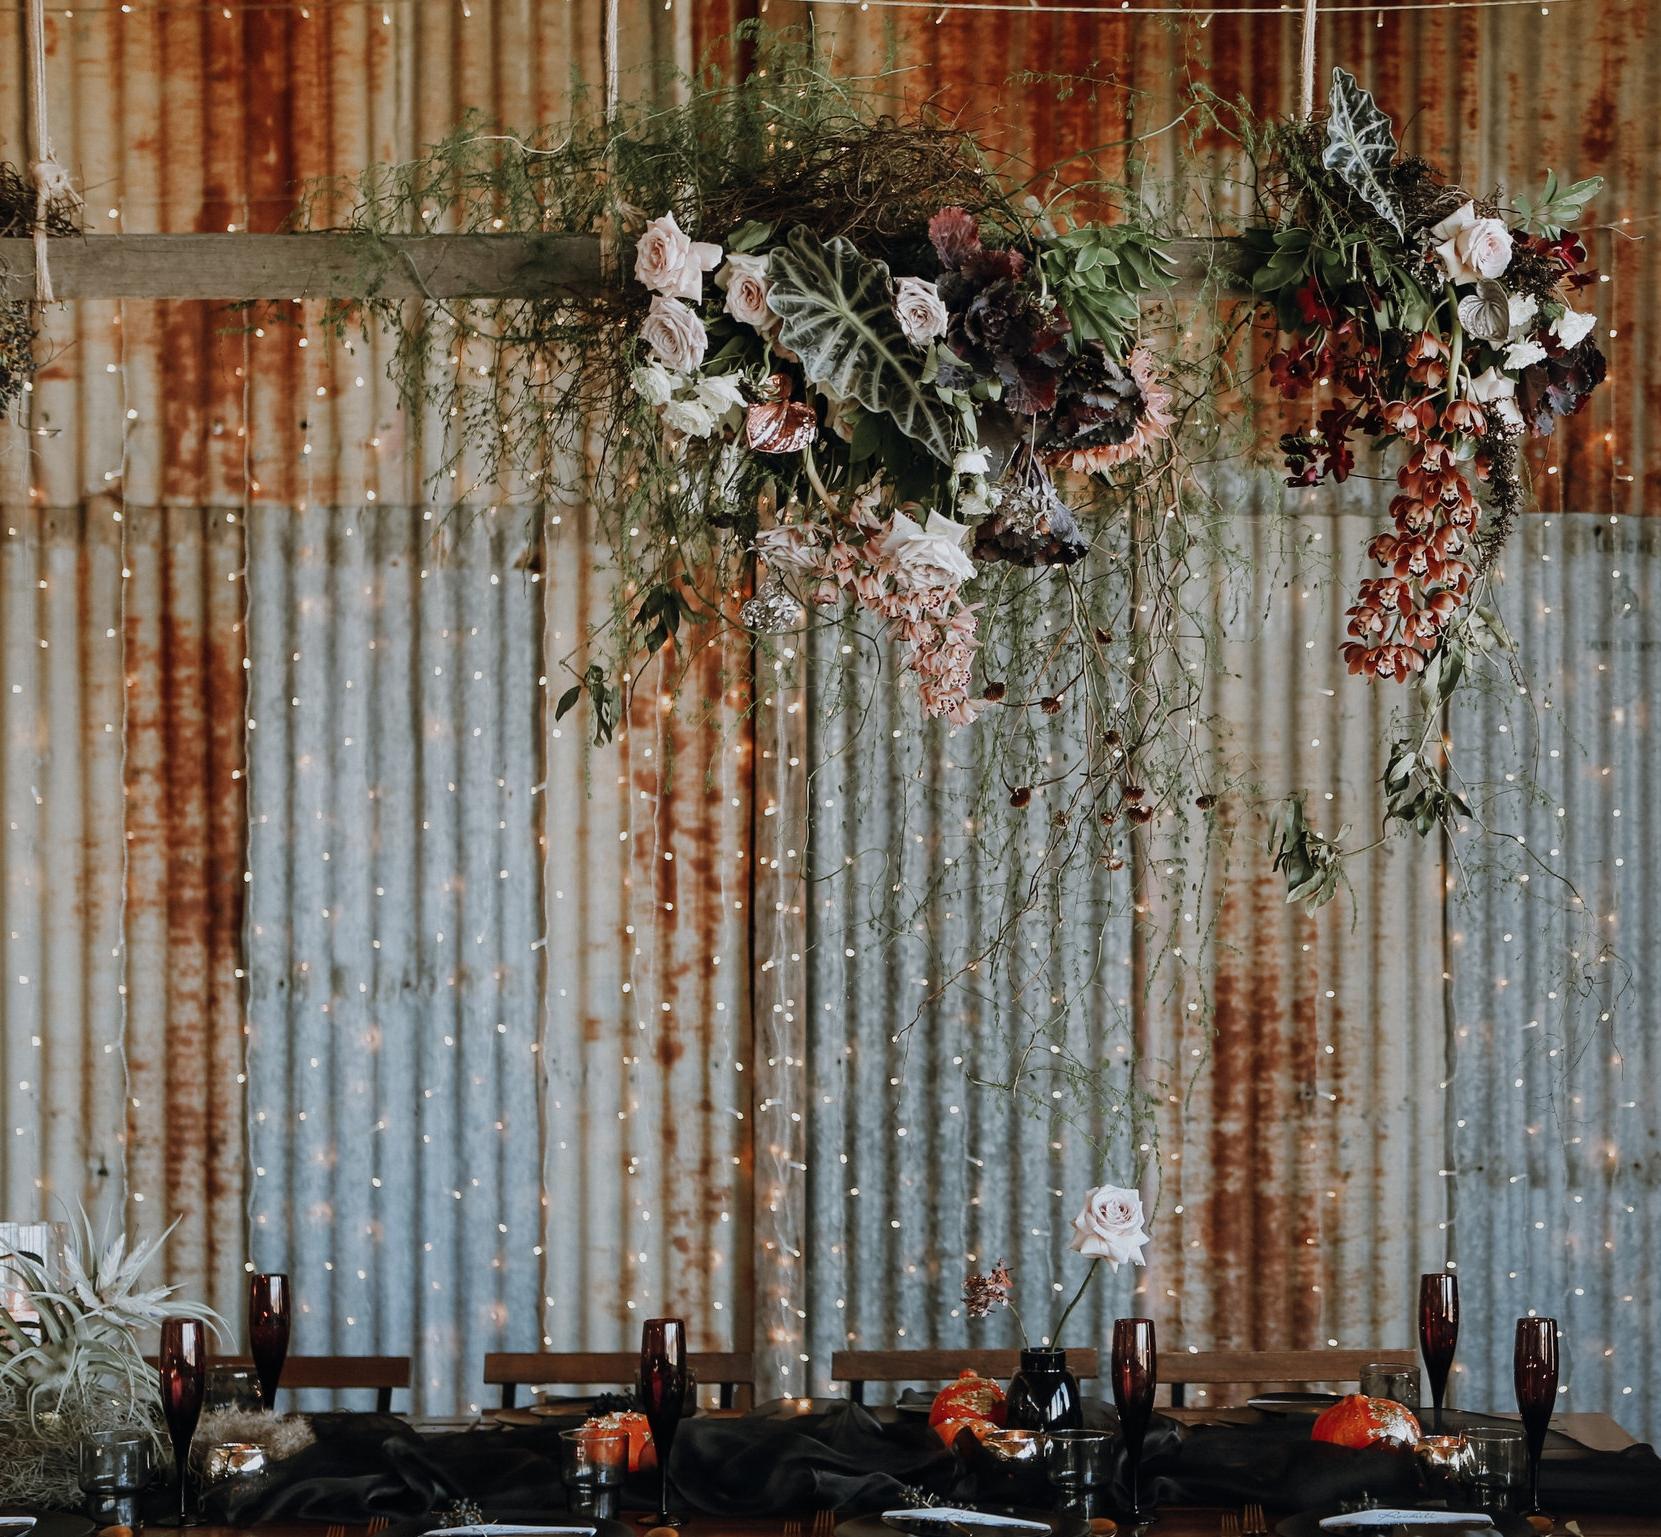 Bloodwood Botanica | Dark Bridal Table